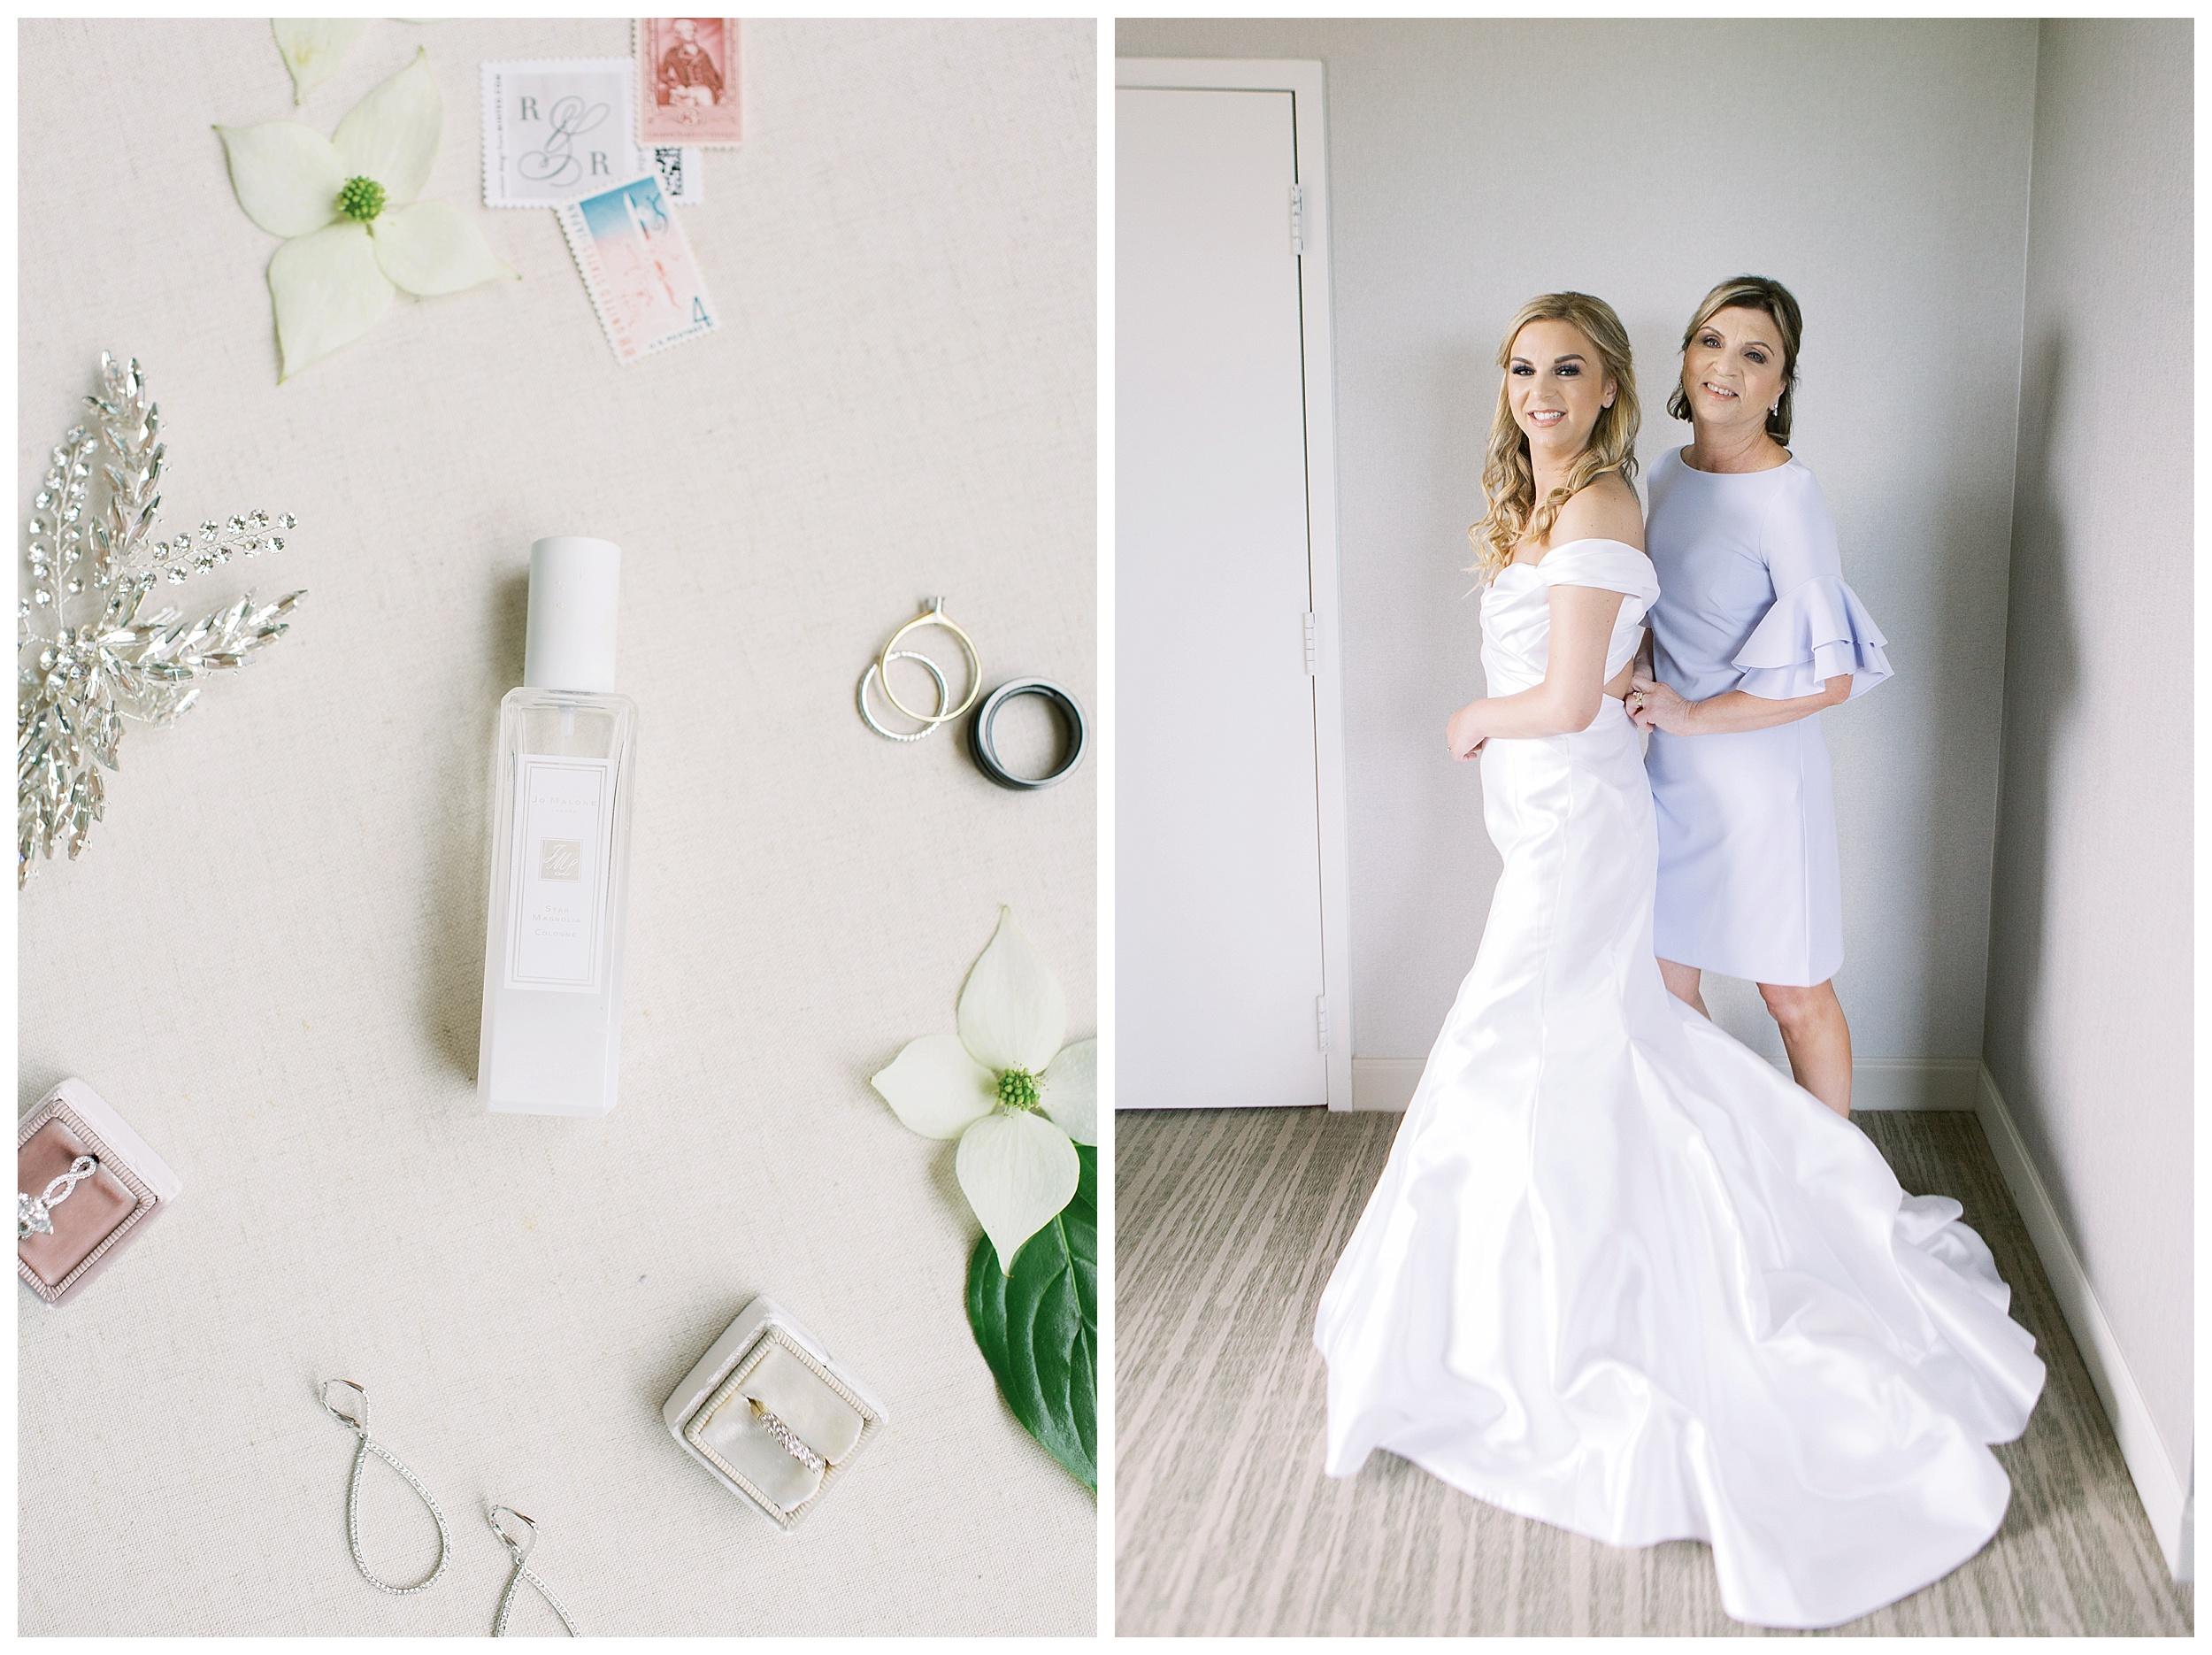 Lansdowne Resort Wedding | Virginia Film Wedding Photographer Kir Tuben_0008.jpg